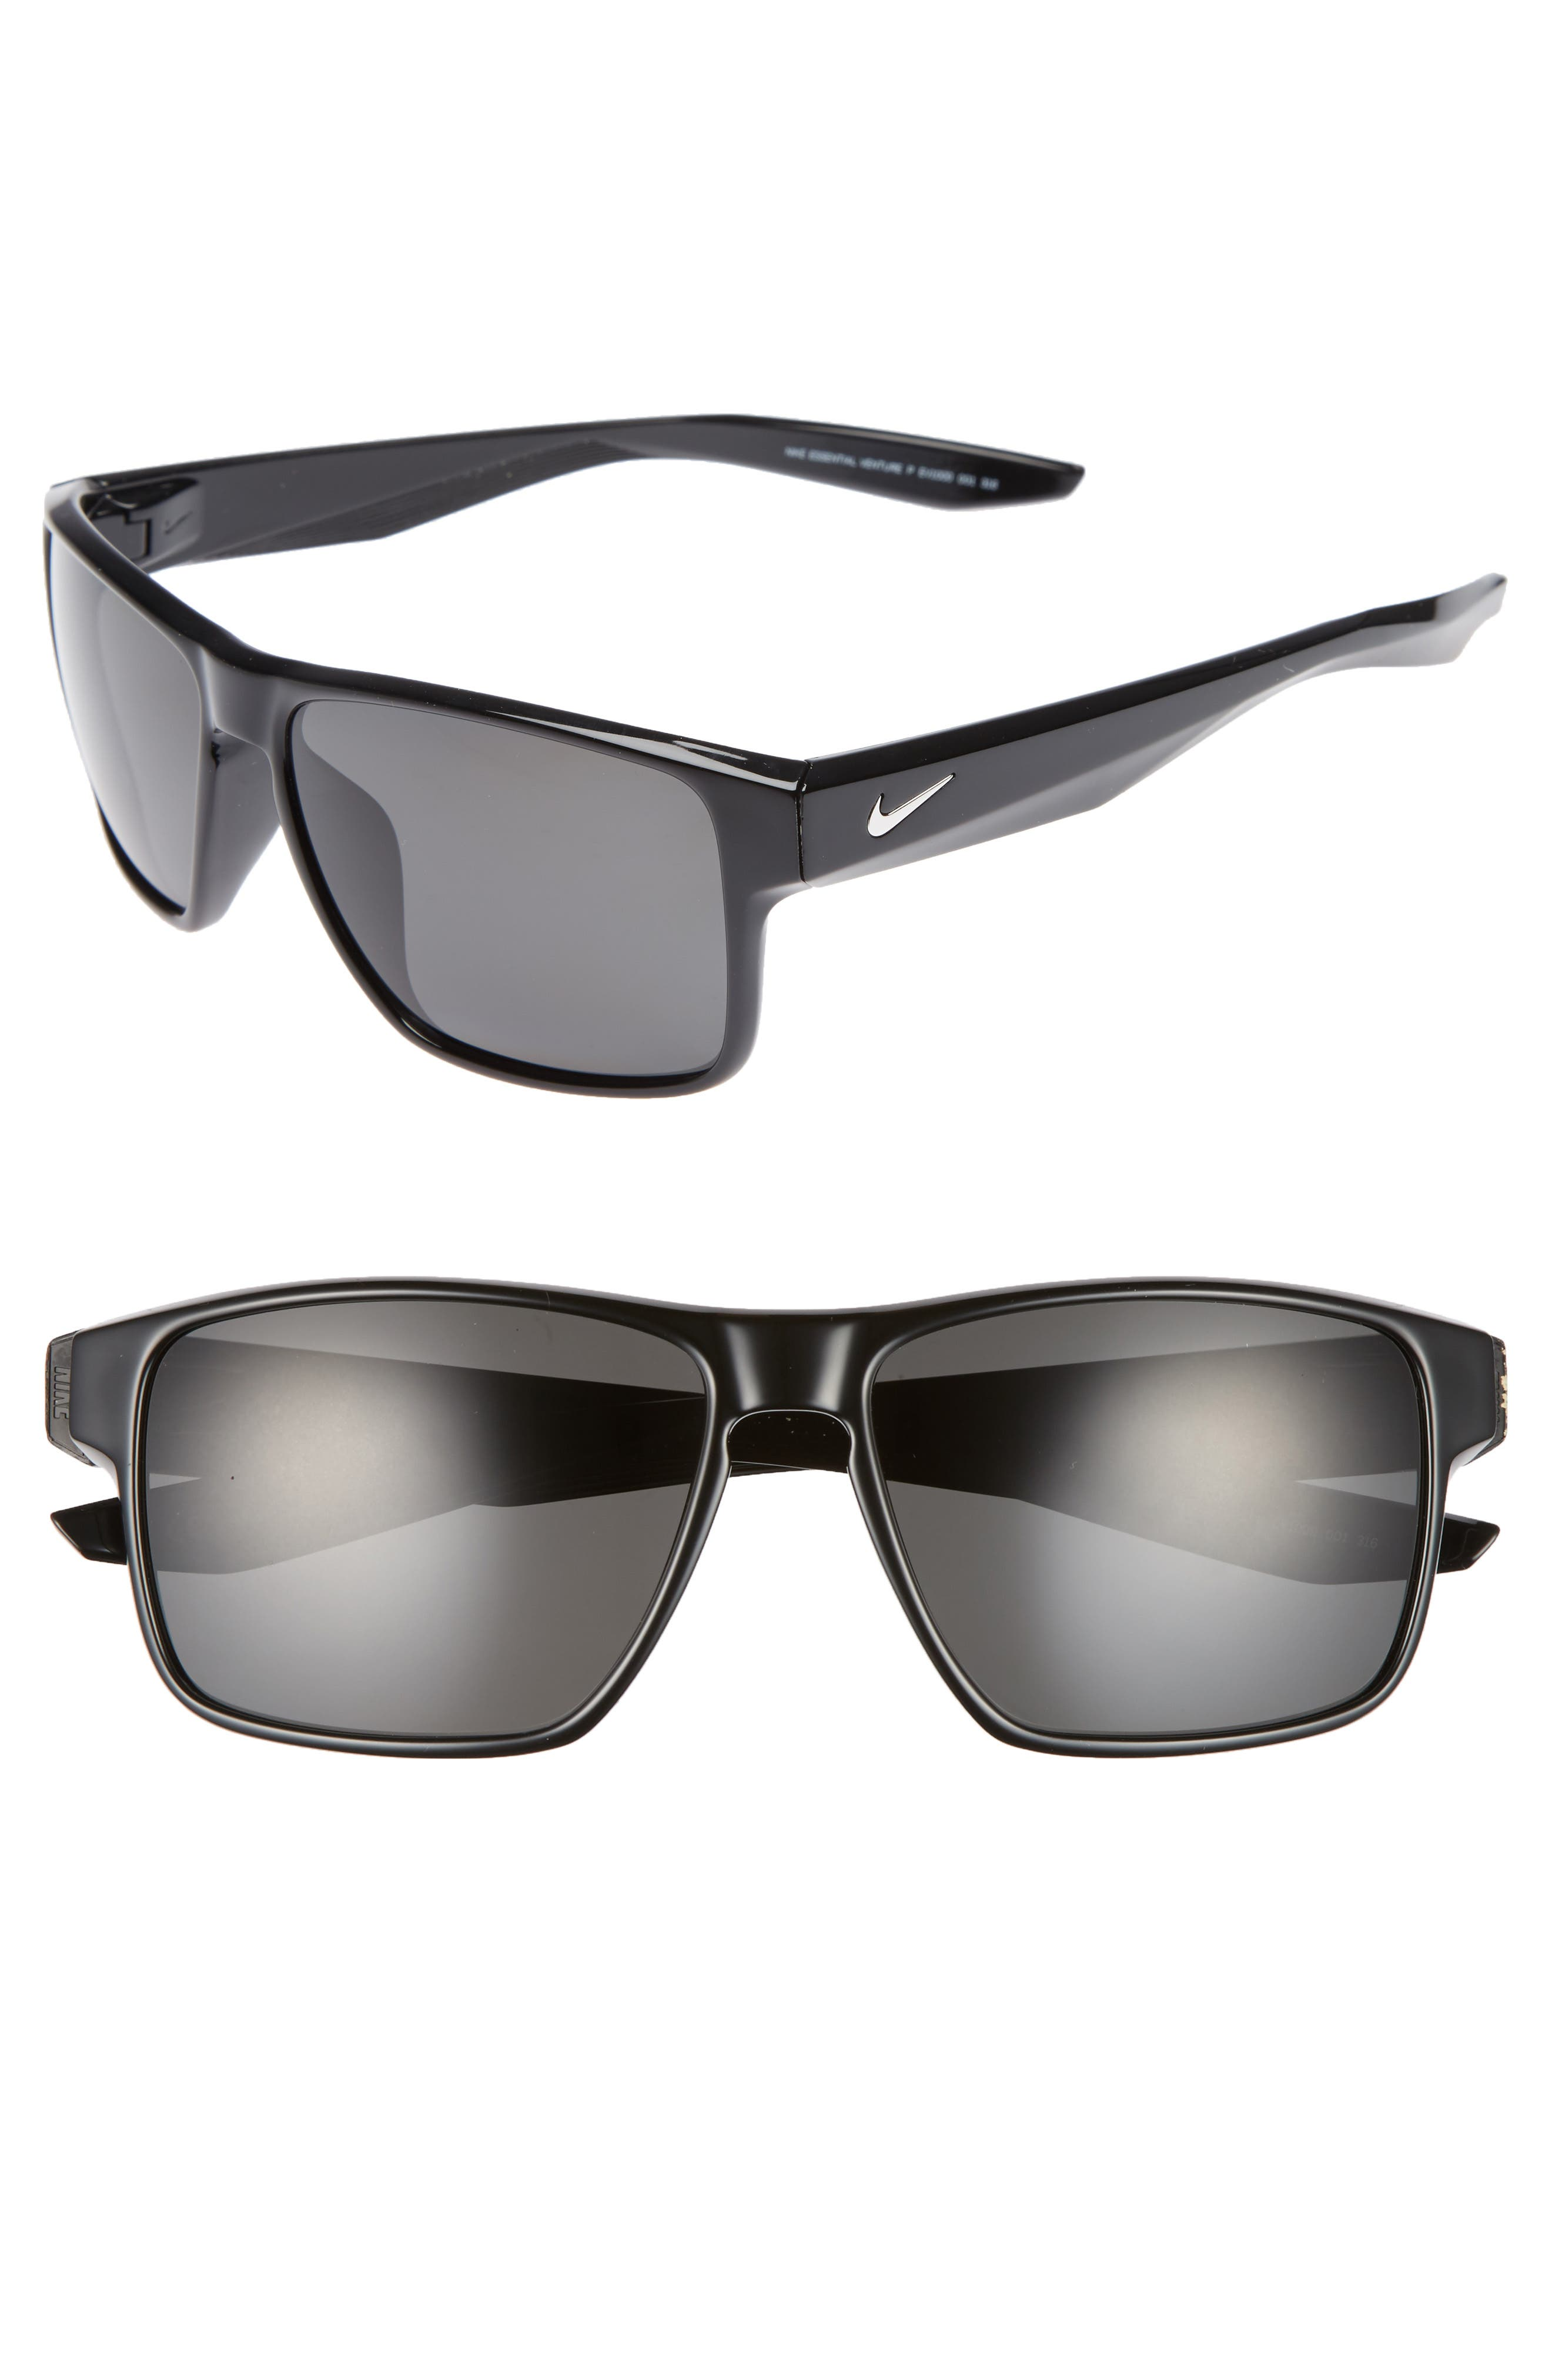 Nike Essential Venture 5m Polarized Sport Sunglasses - Matte Black